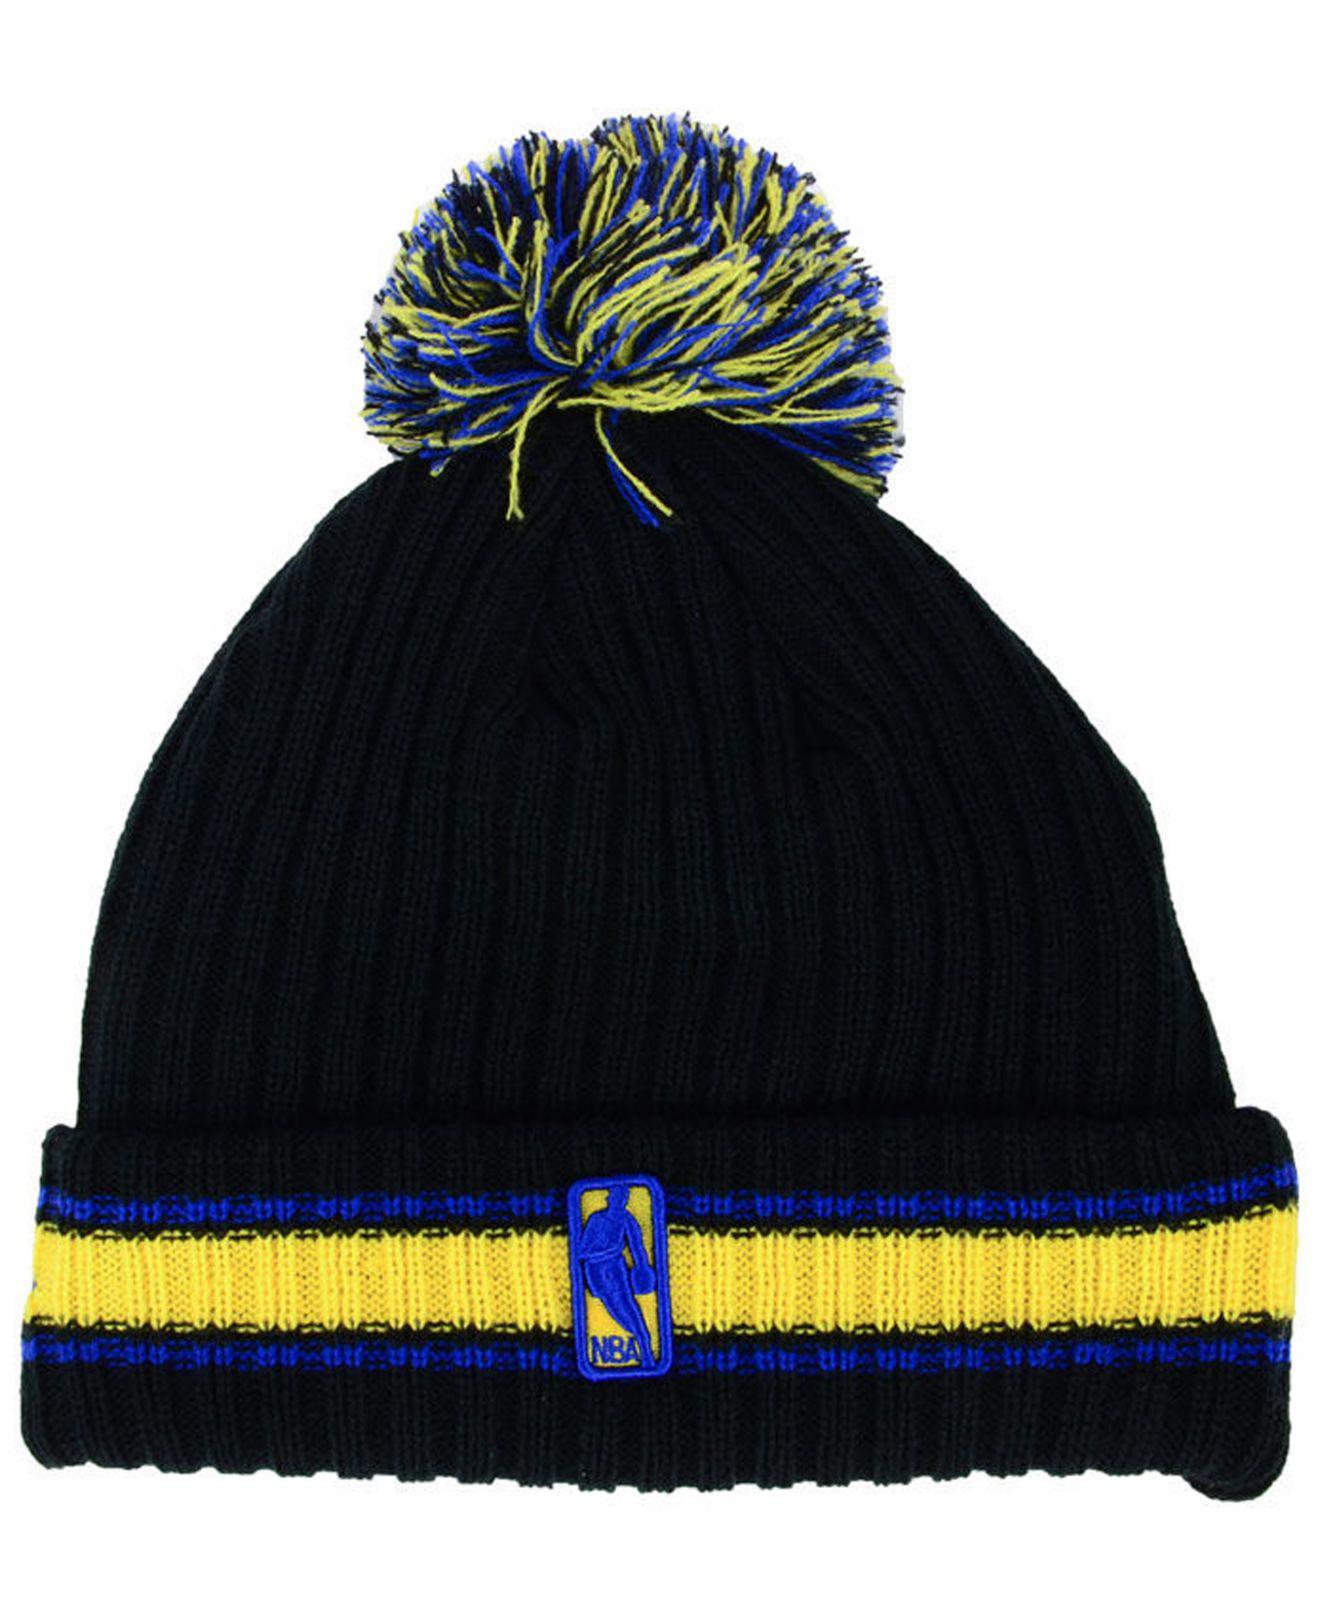 wholesale dealer f49ea d3ad6 spain cleveland cavaliers new era nba basic link 9fifty snapback cap c7f16  d7b9b  sale lyst ktz basic chunky pom knit hat in black for men 7dd1b 35d0d